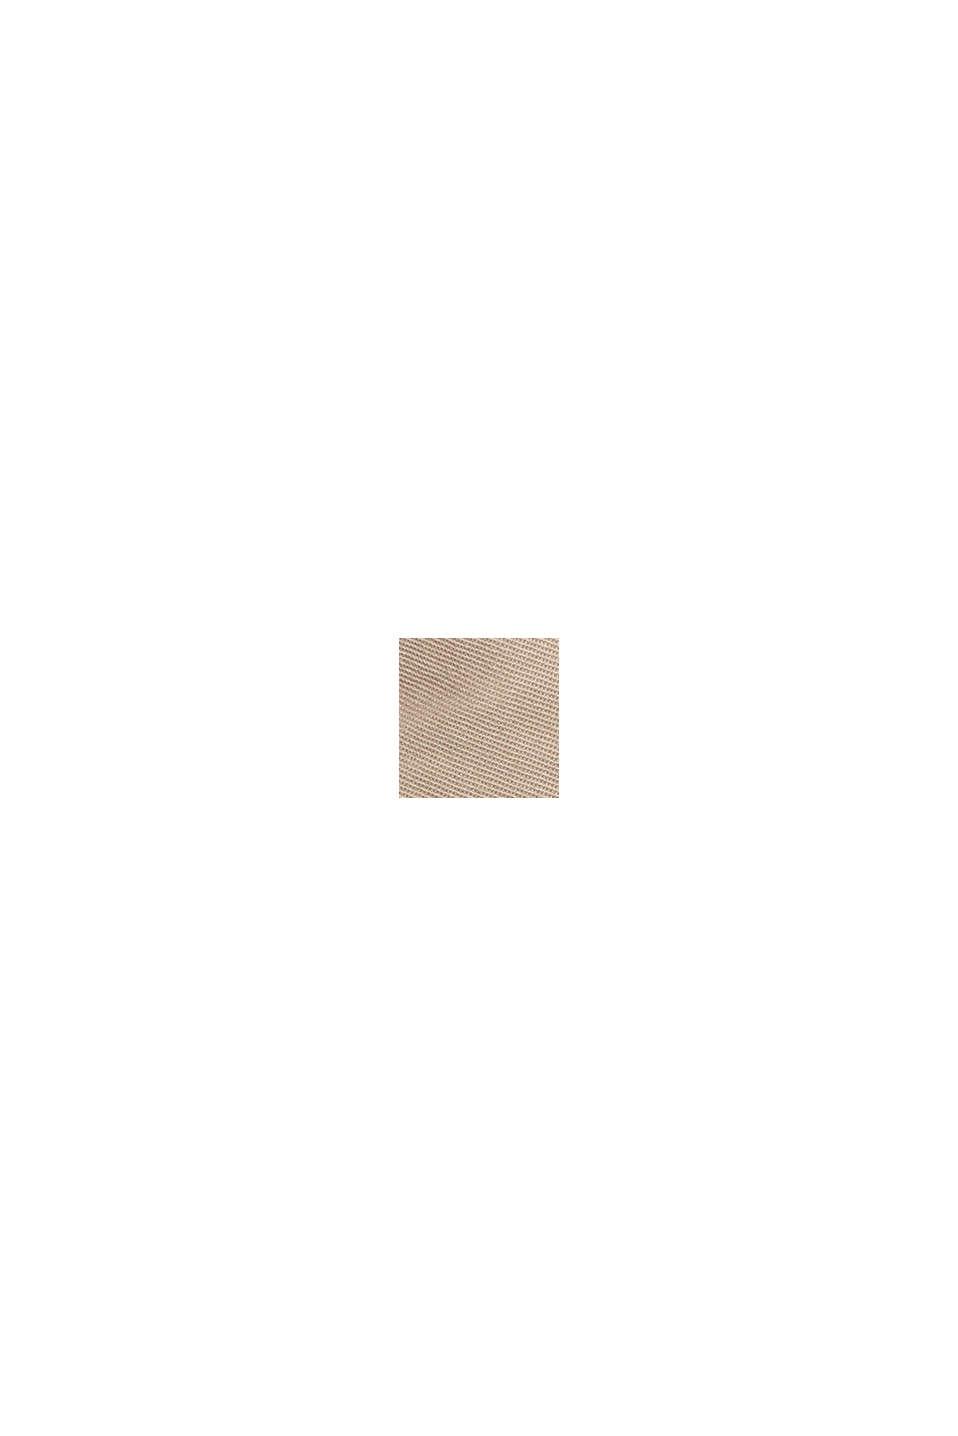 Minigonna PLAY in 100% cotone biologico, BEIGE, swatch